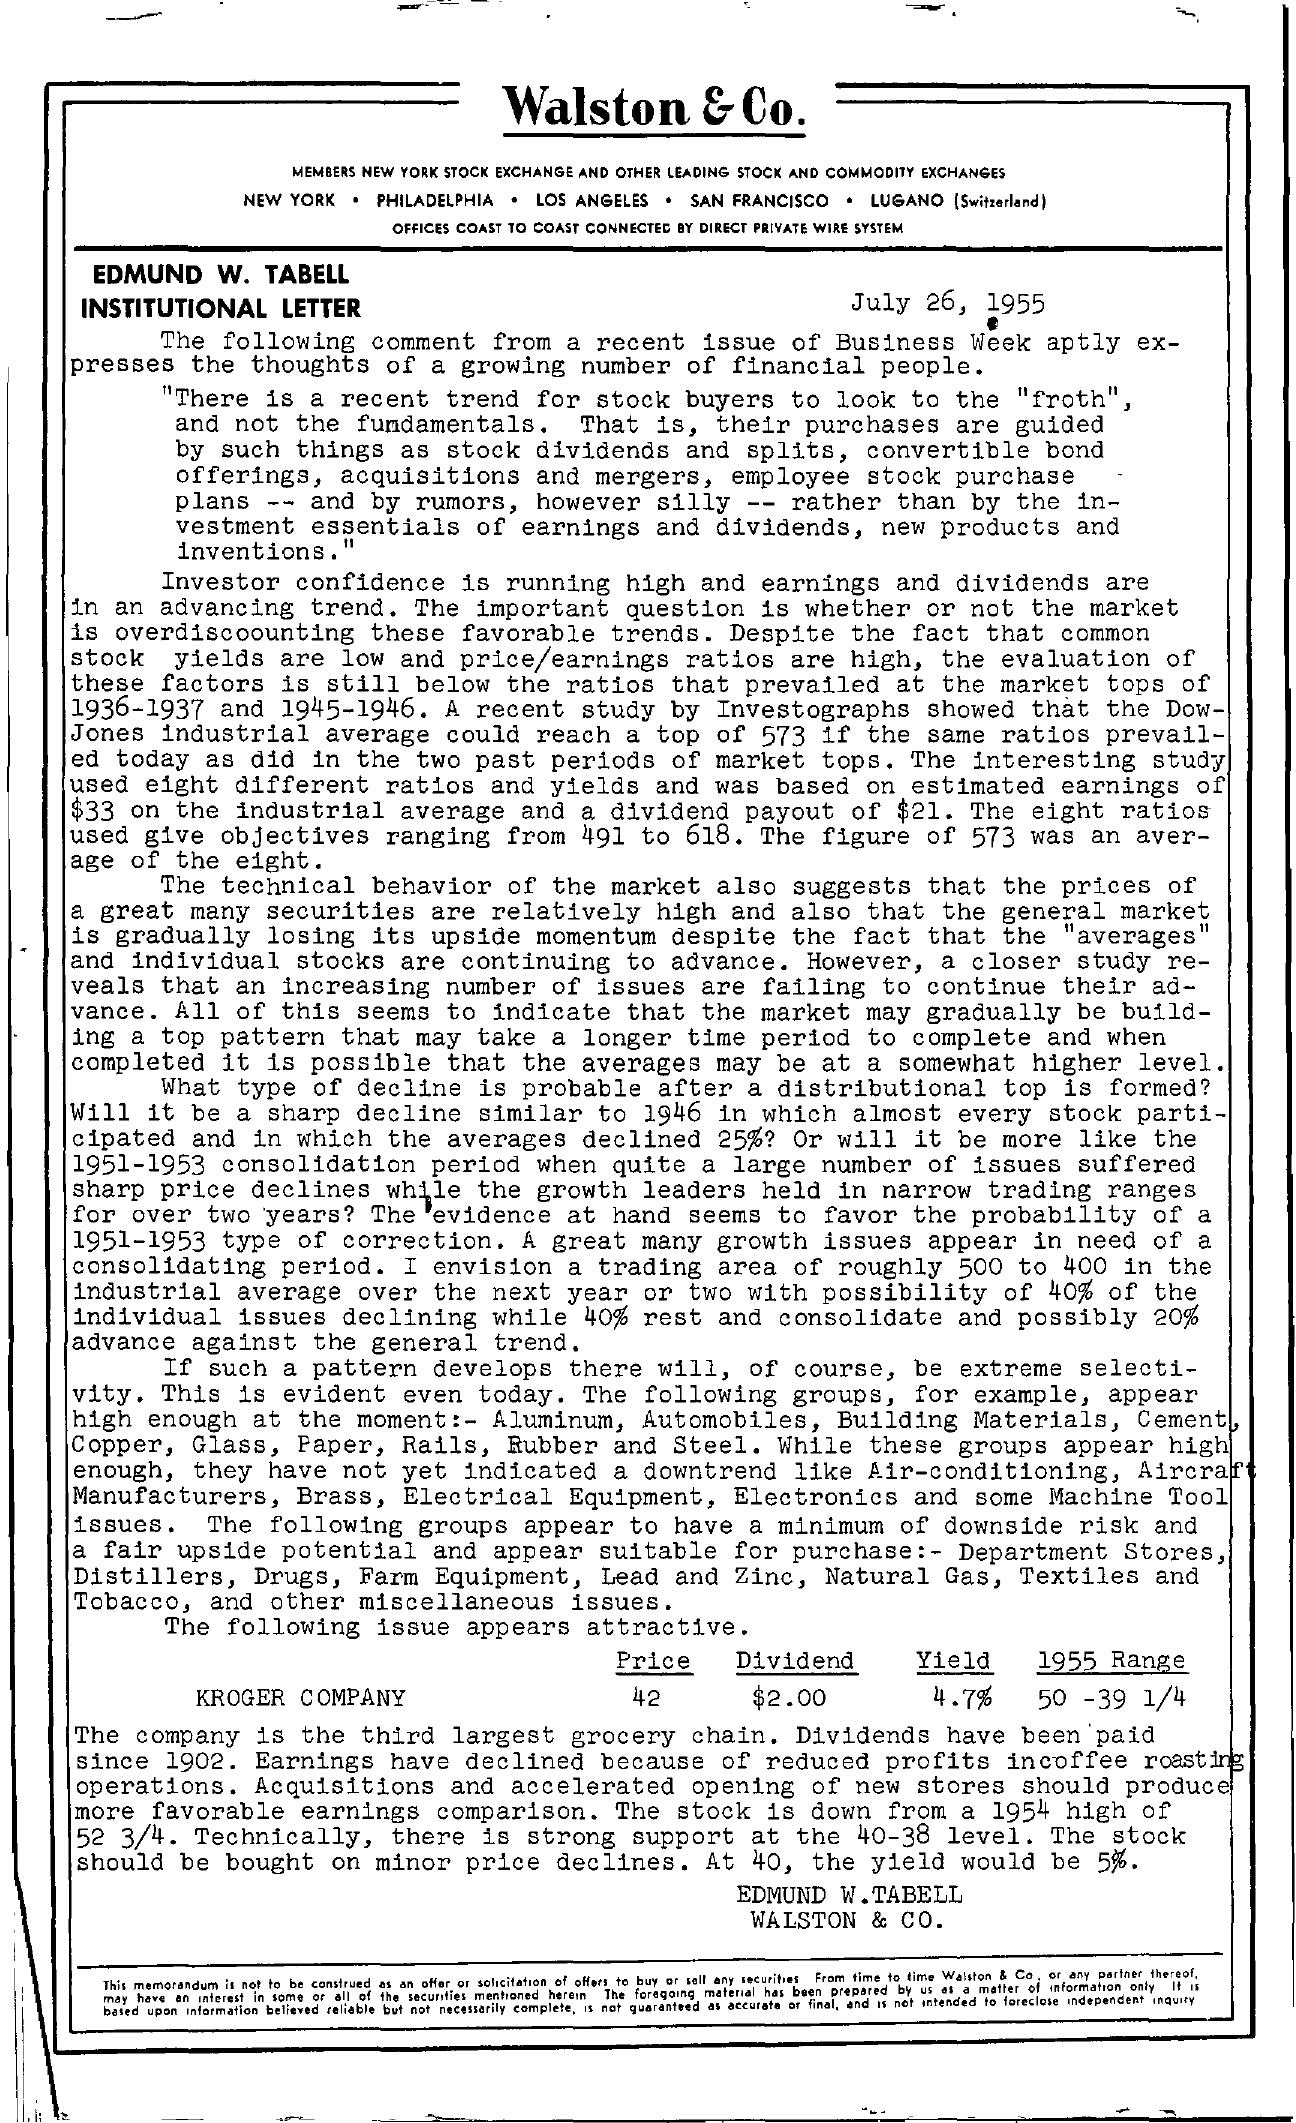 Tabell's Market Letter - July 26, 1955